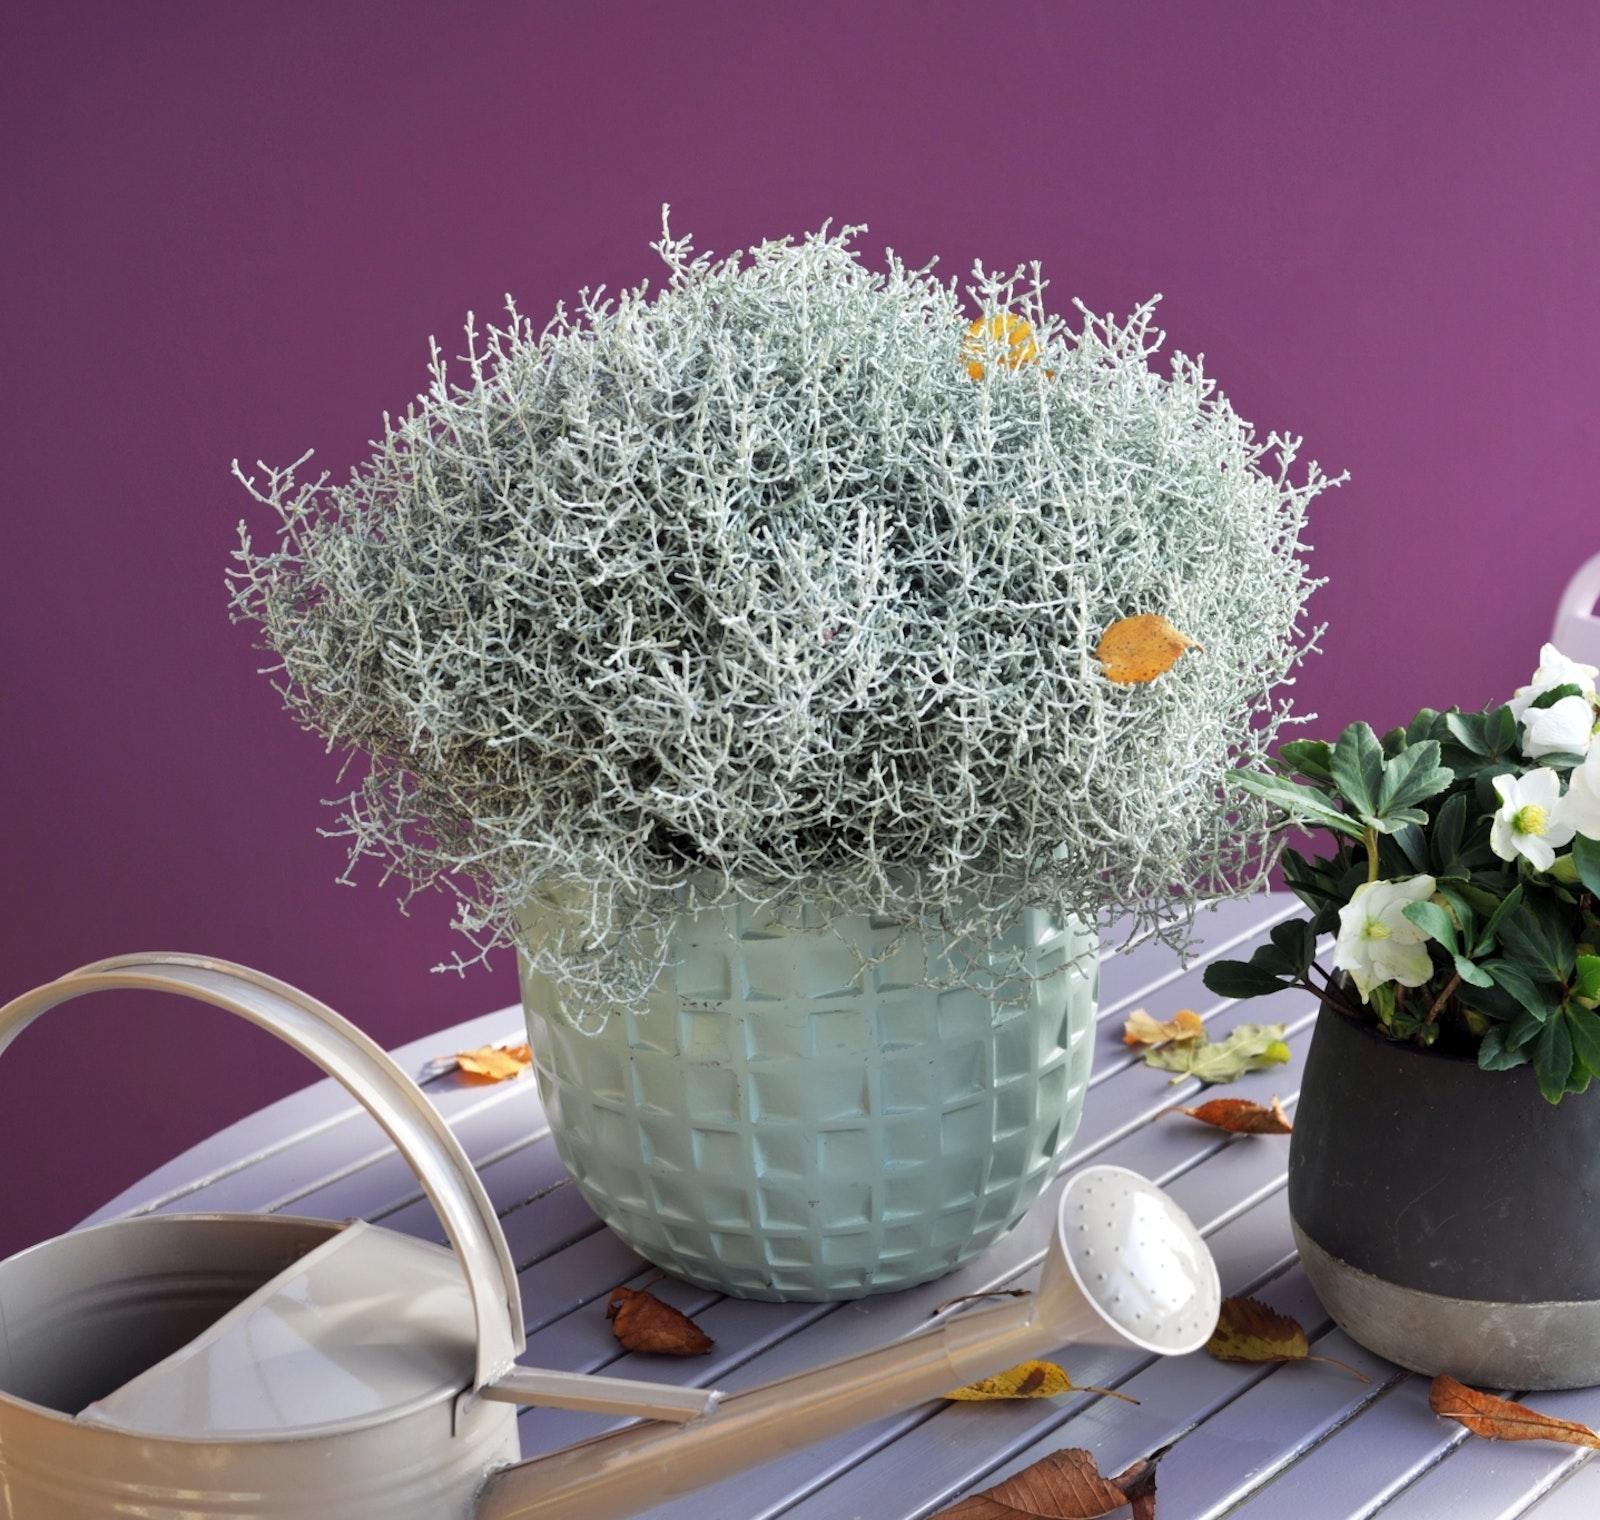 mooiwatplantendoen.nl Equalise trend calocephalus helleborus 003 hr klein